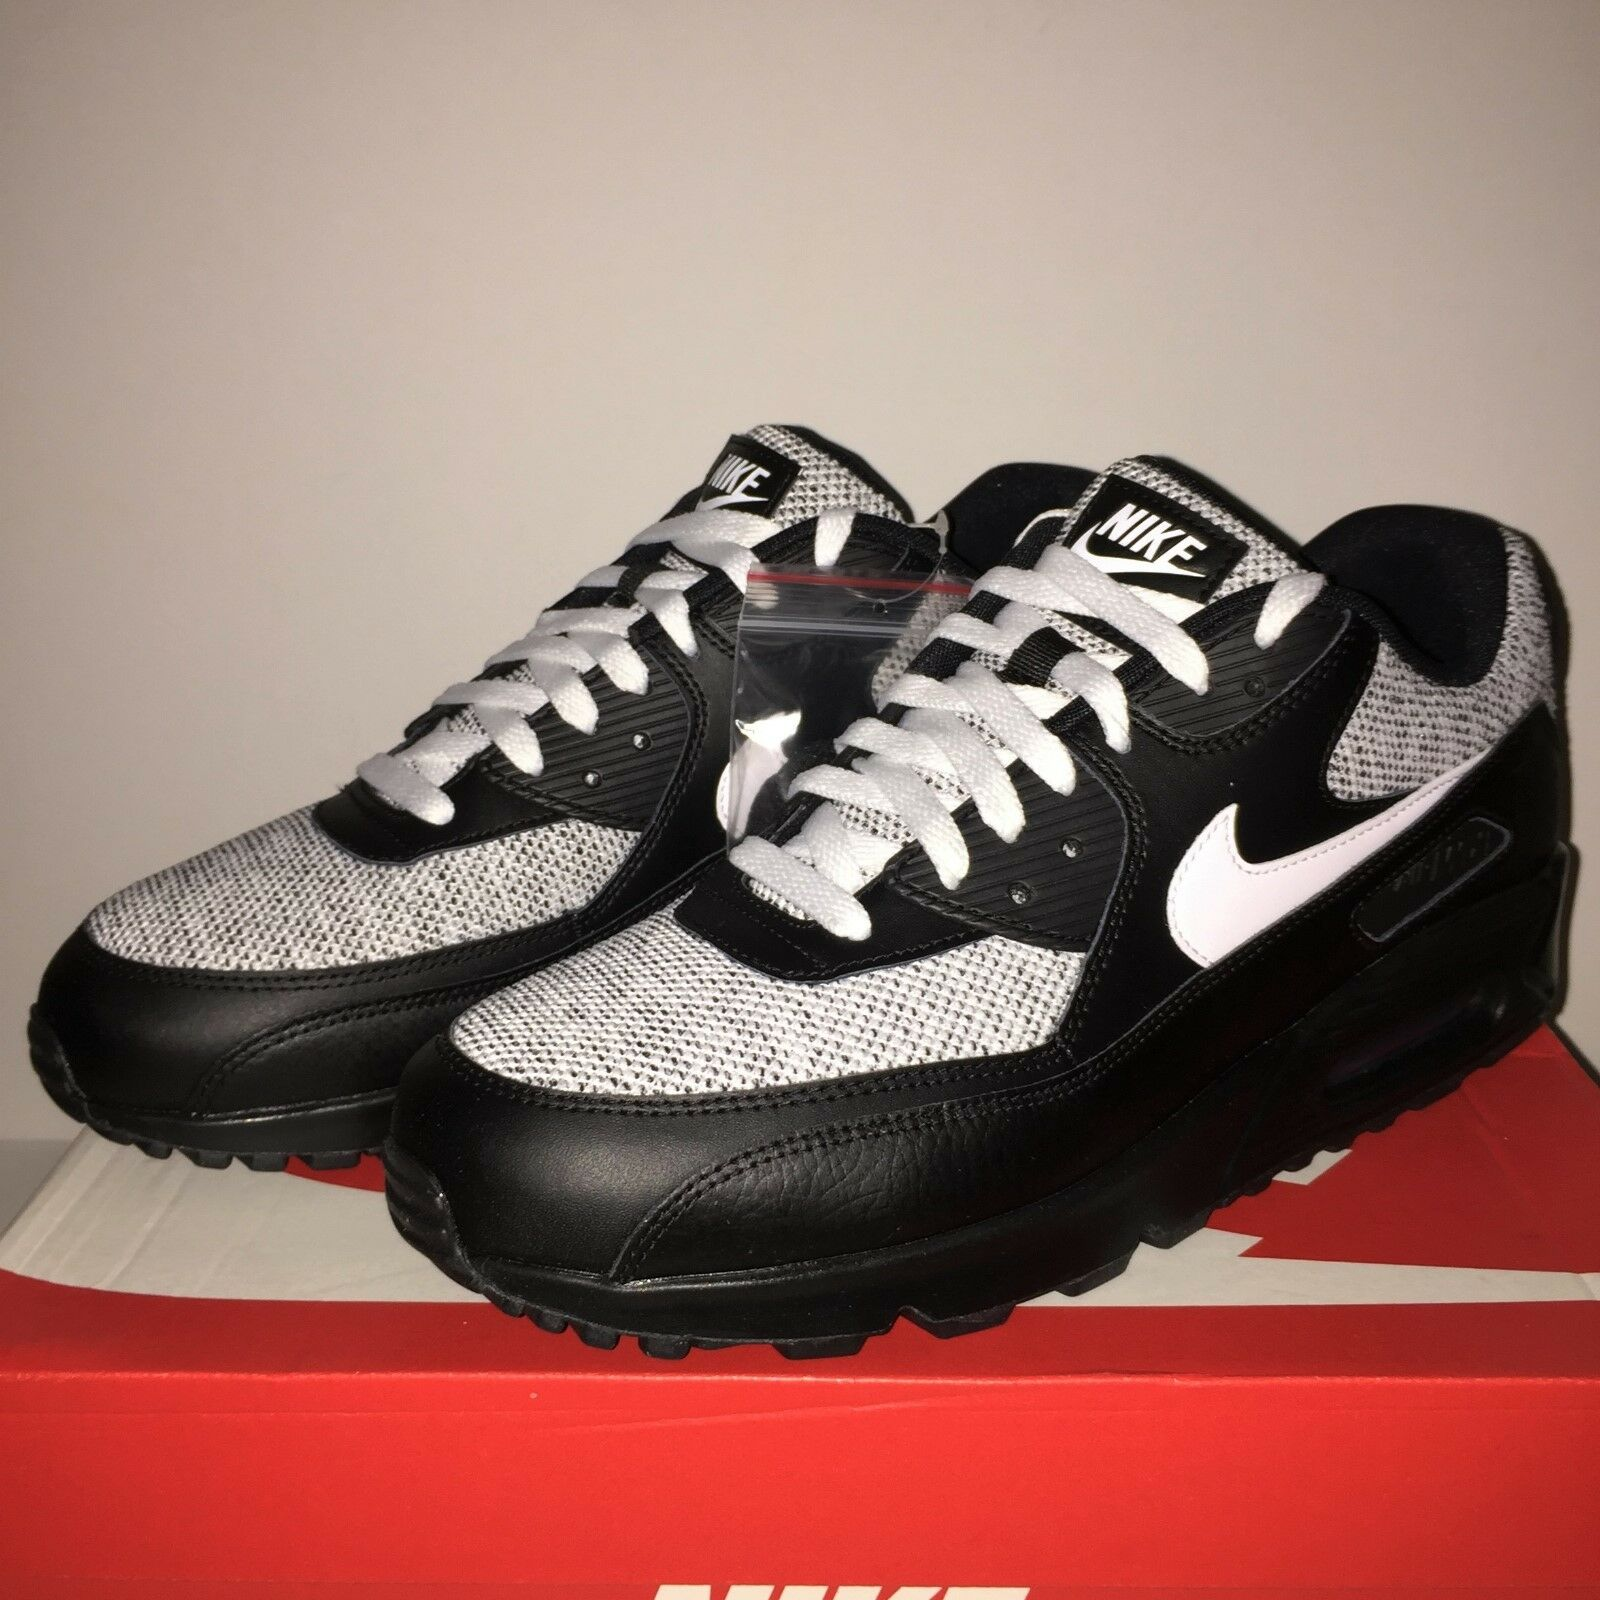 Nike Air Max 90 Essential UK 10  Eur 45 - Brand New (537384 079)